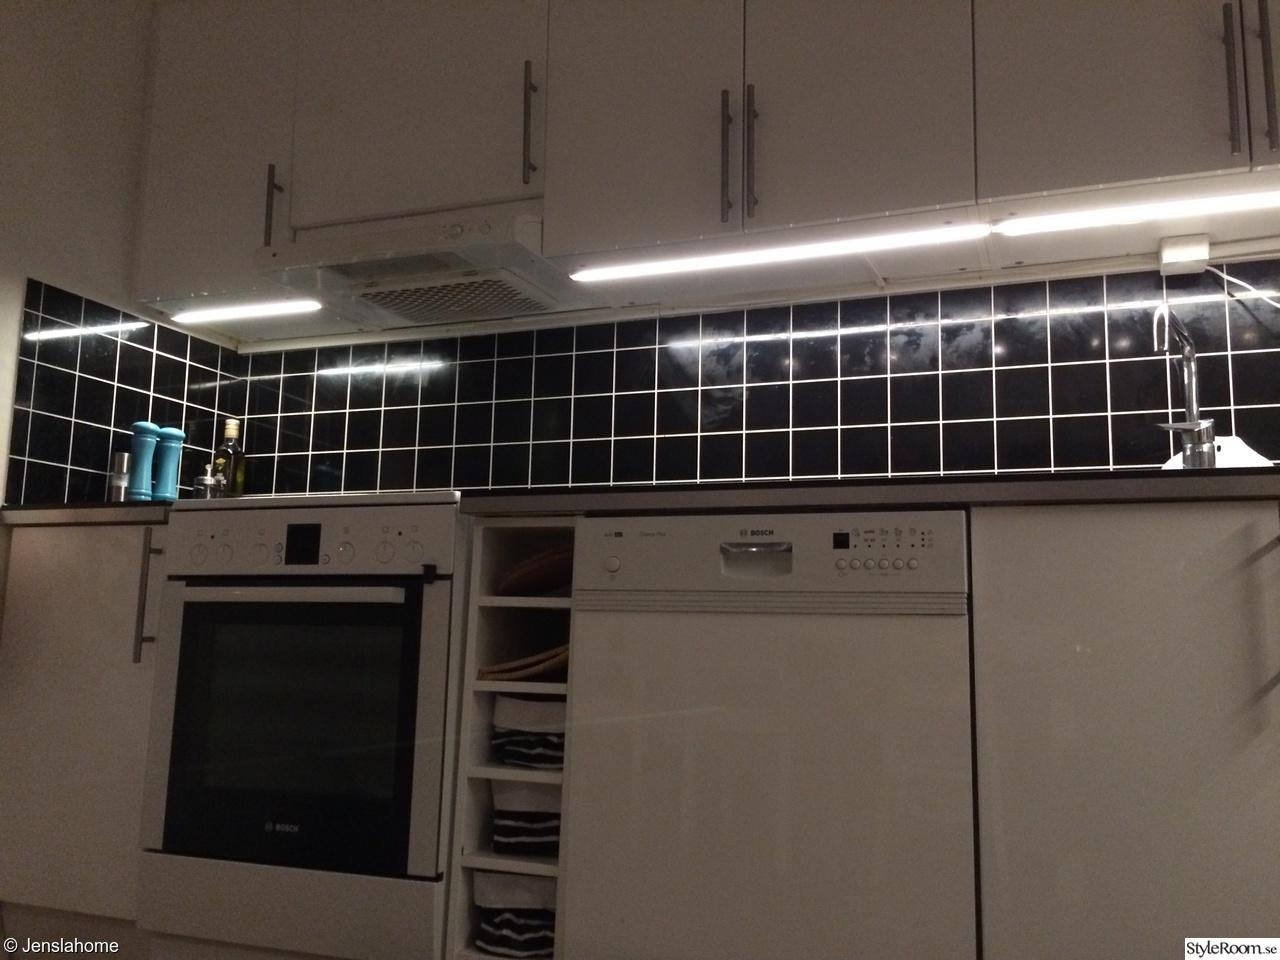 Led Belysning Kok Ikea : bonkbelysning kok ikea  Nyckelord koksbelysning , bonkbelysning